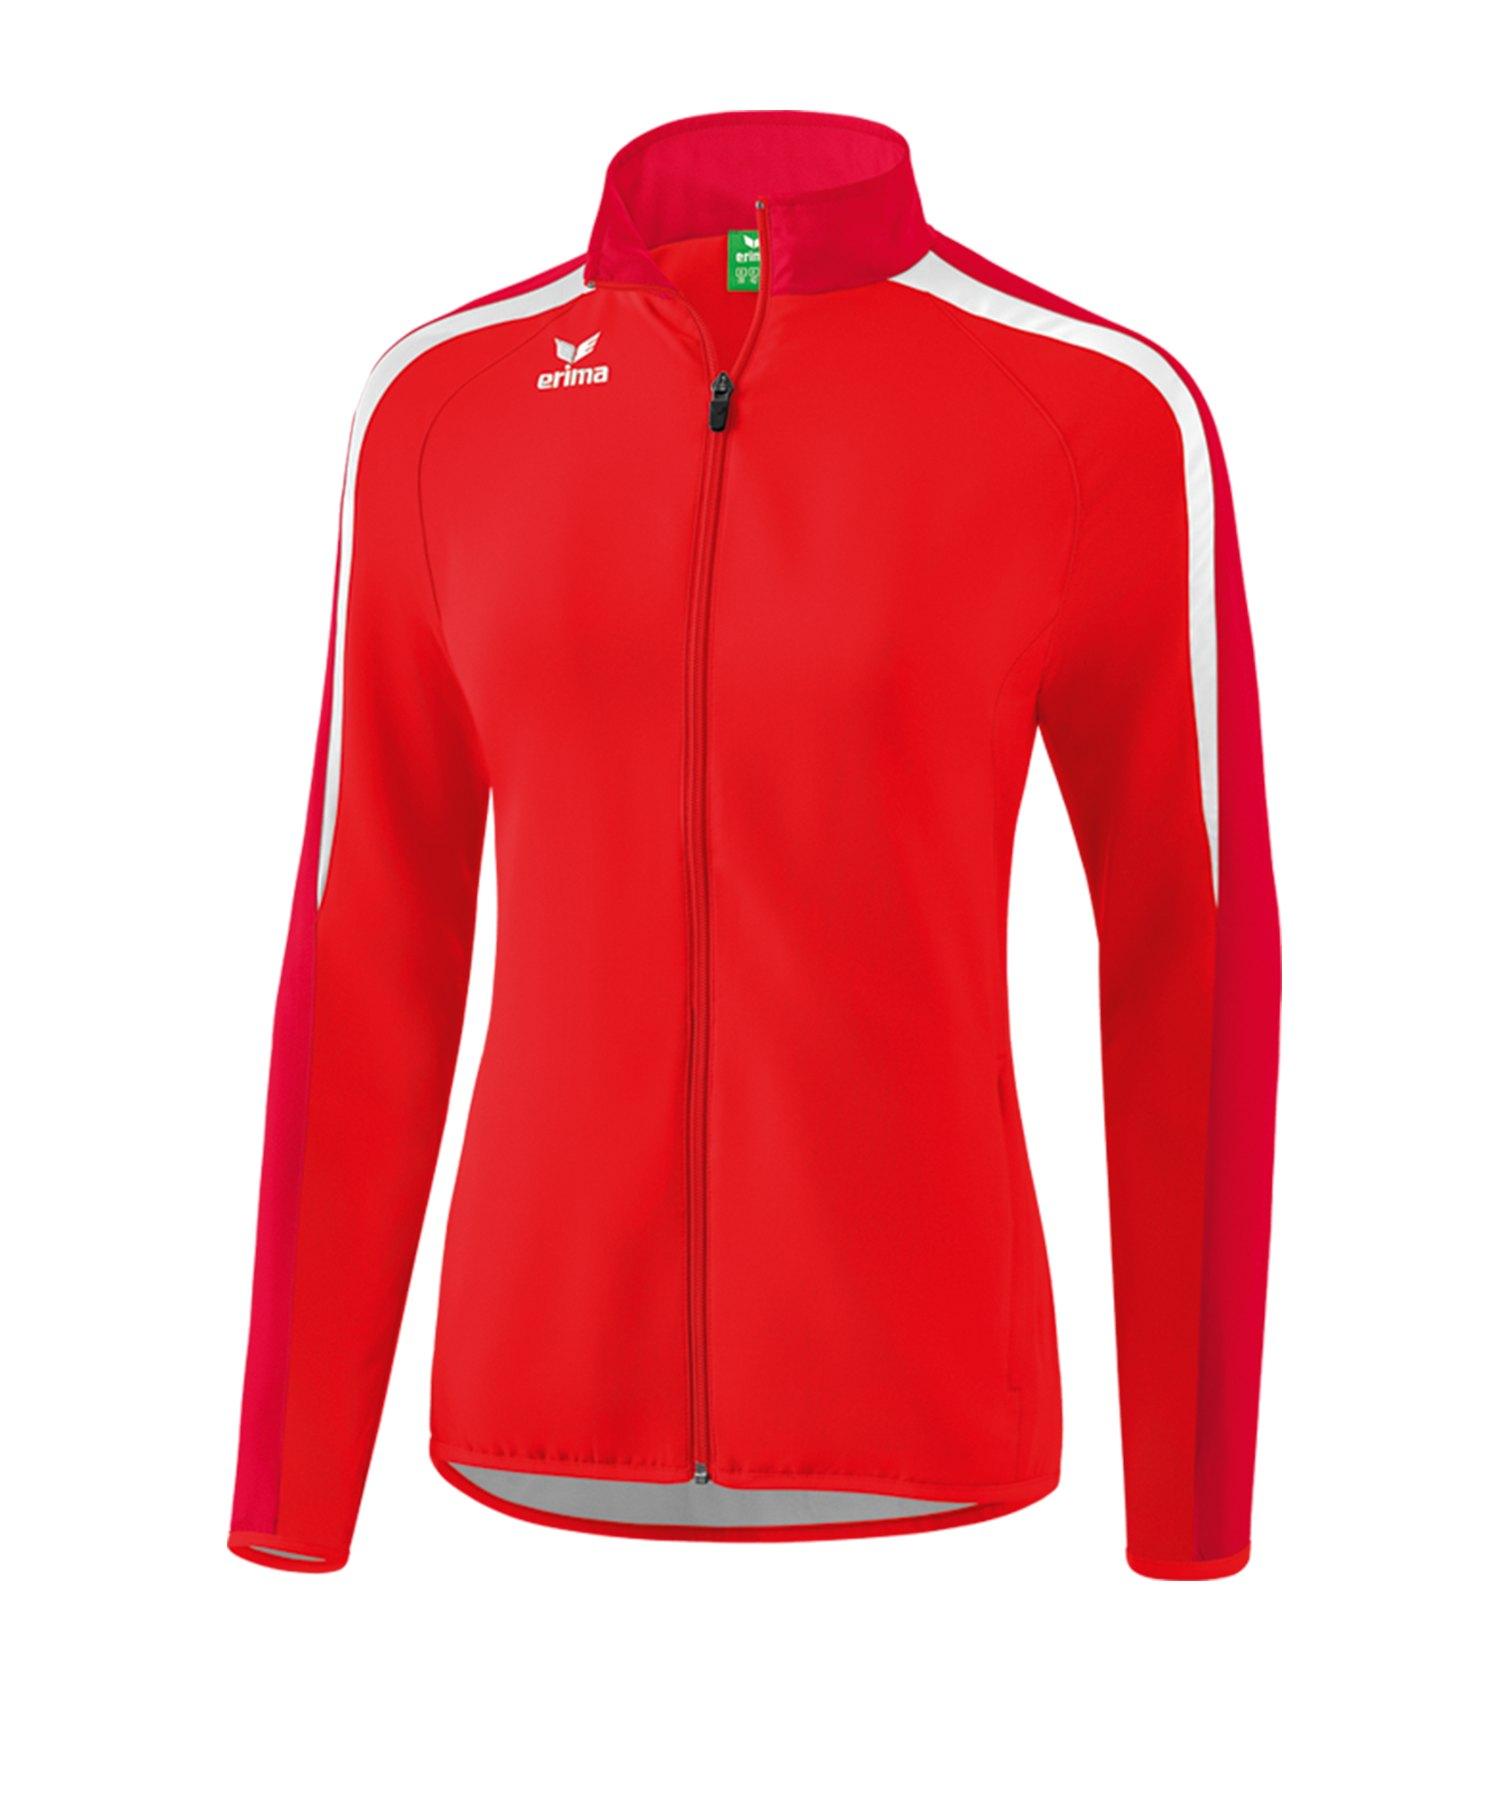 Erima Liga 2.0 Präsentationsjacke Damen Rot Weiss - rot